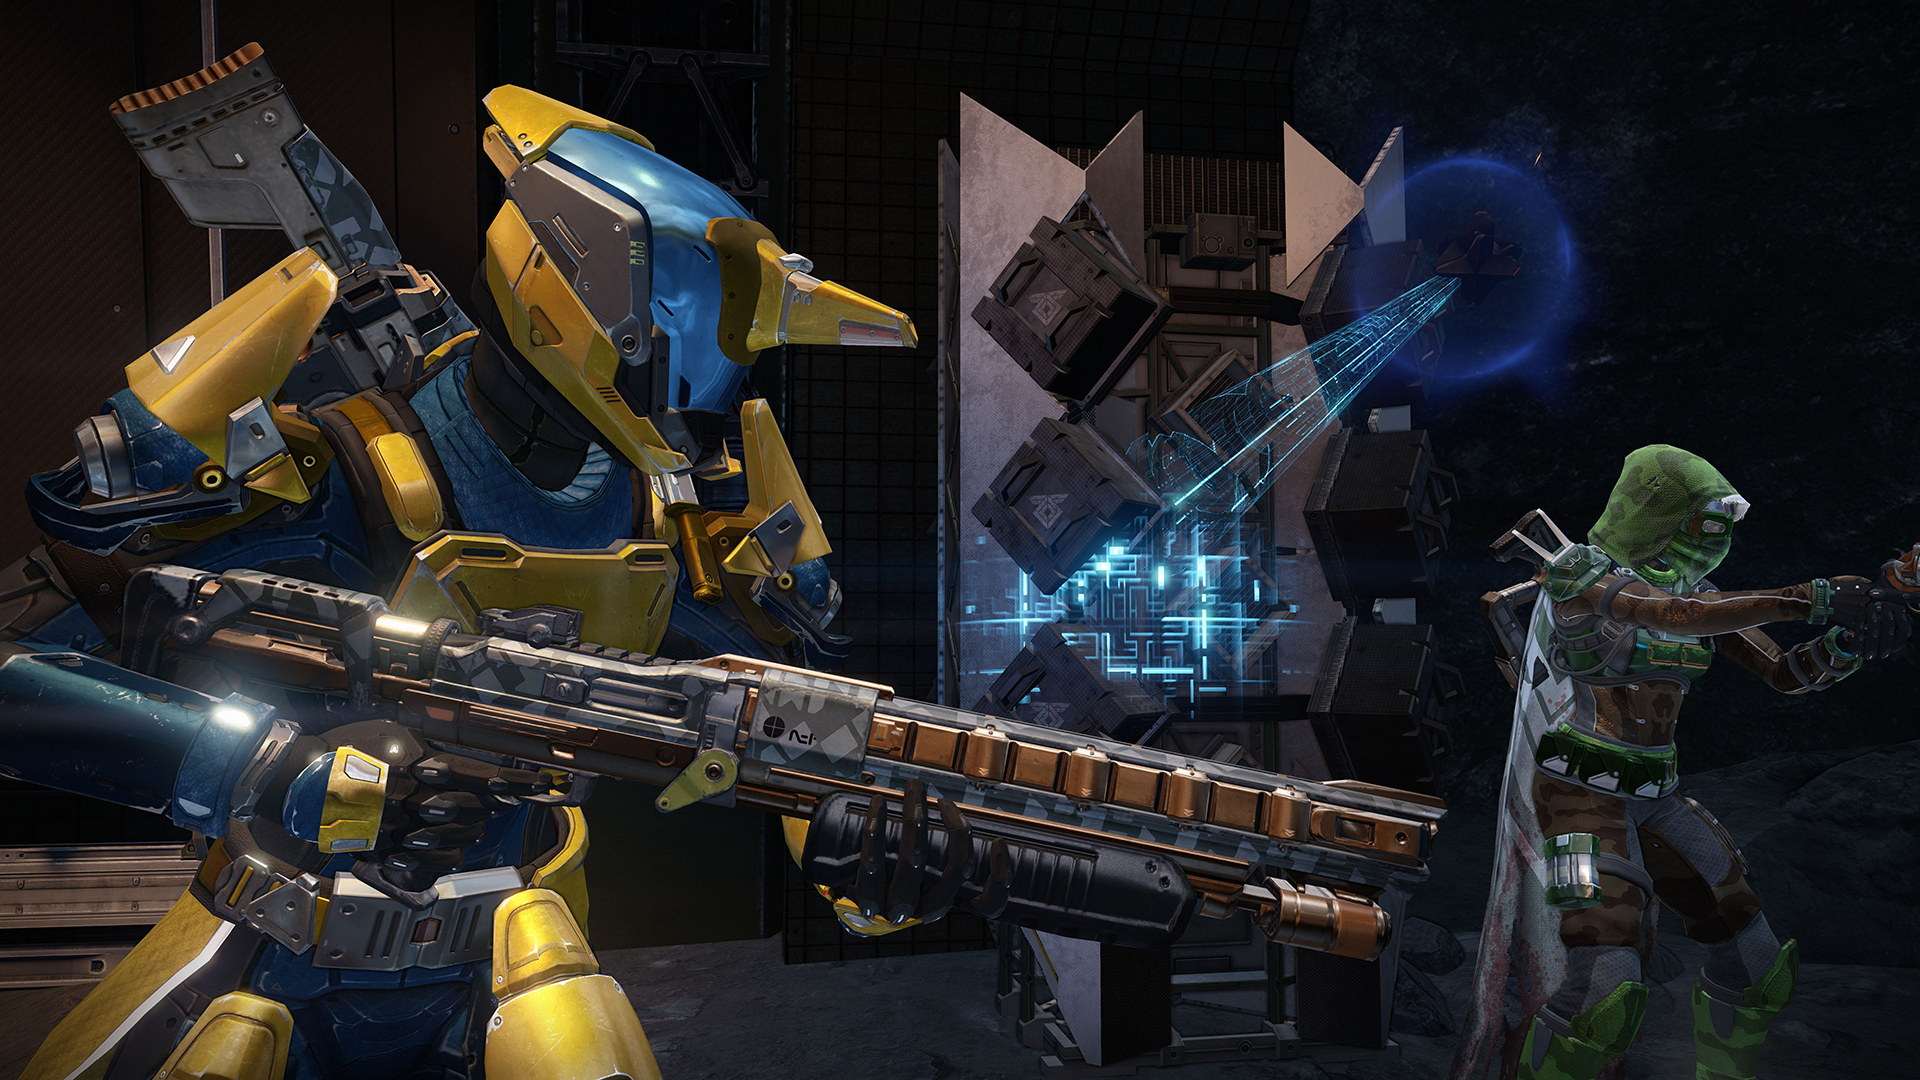 Destiny - Moon Anomaly - Salvage - 3x3 - Multiplayer Screenshot Full HD